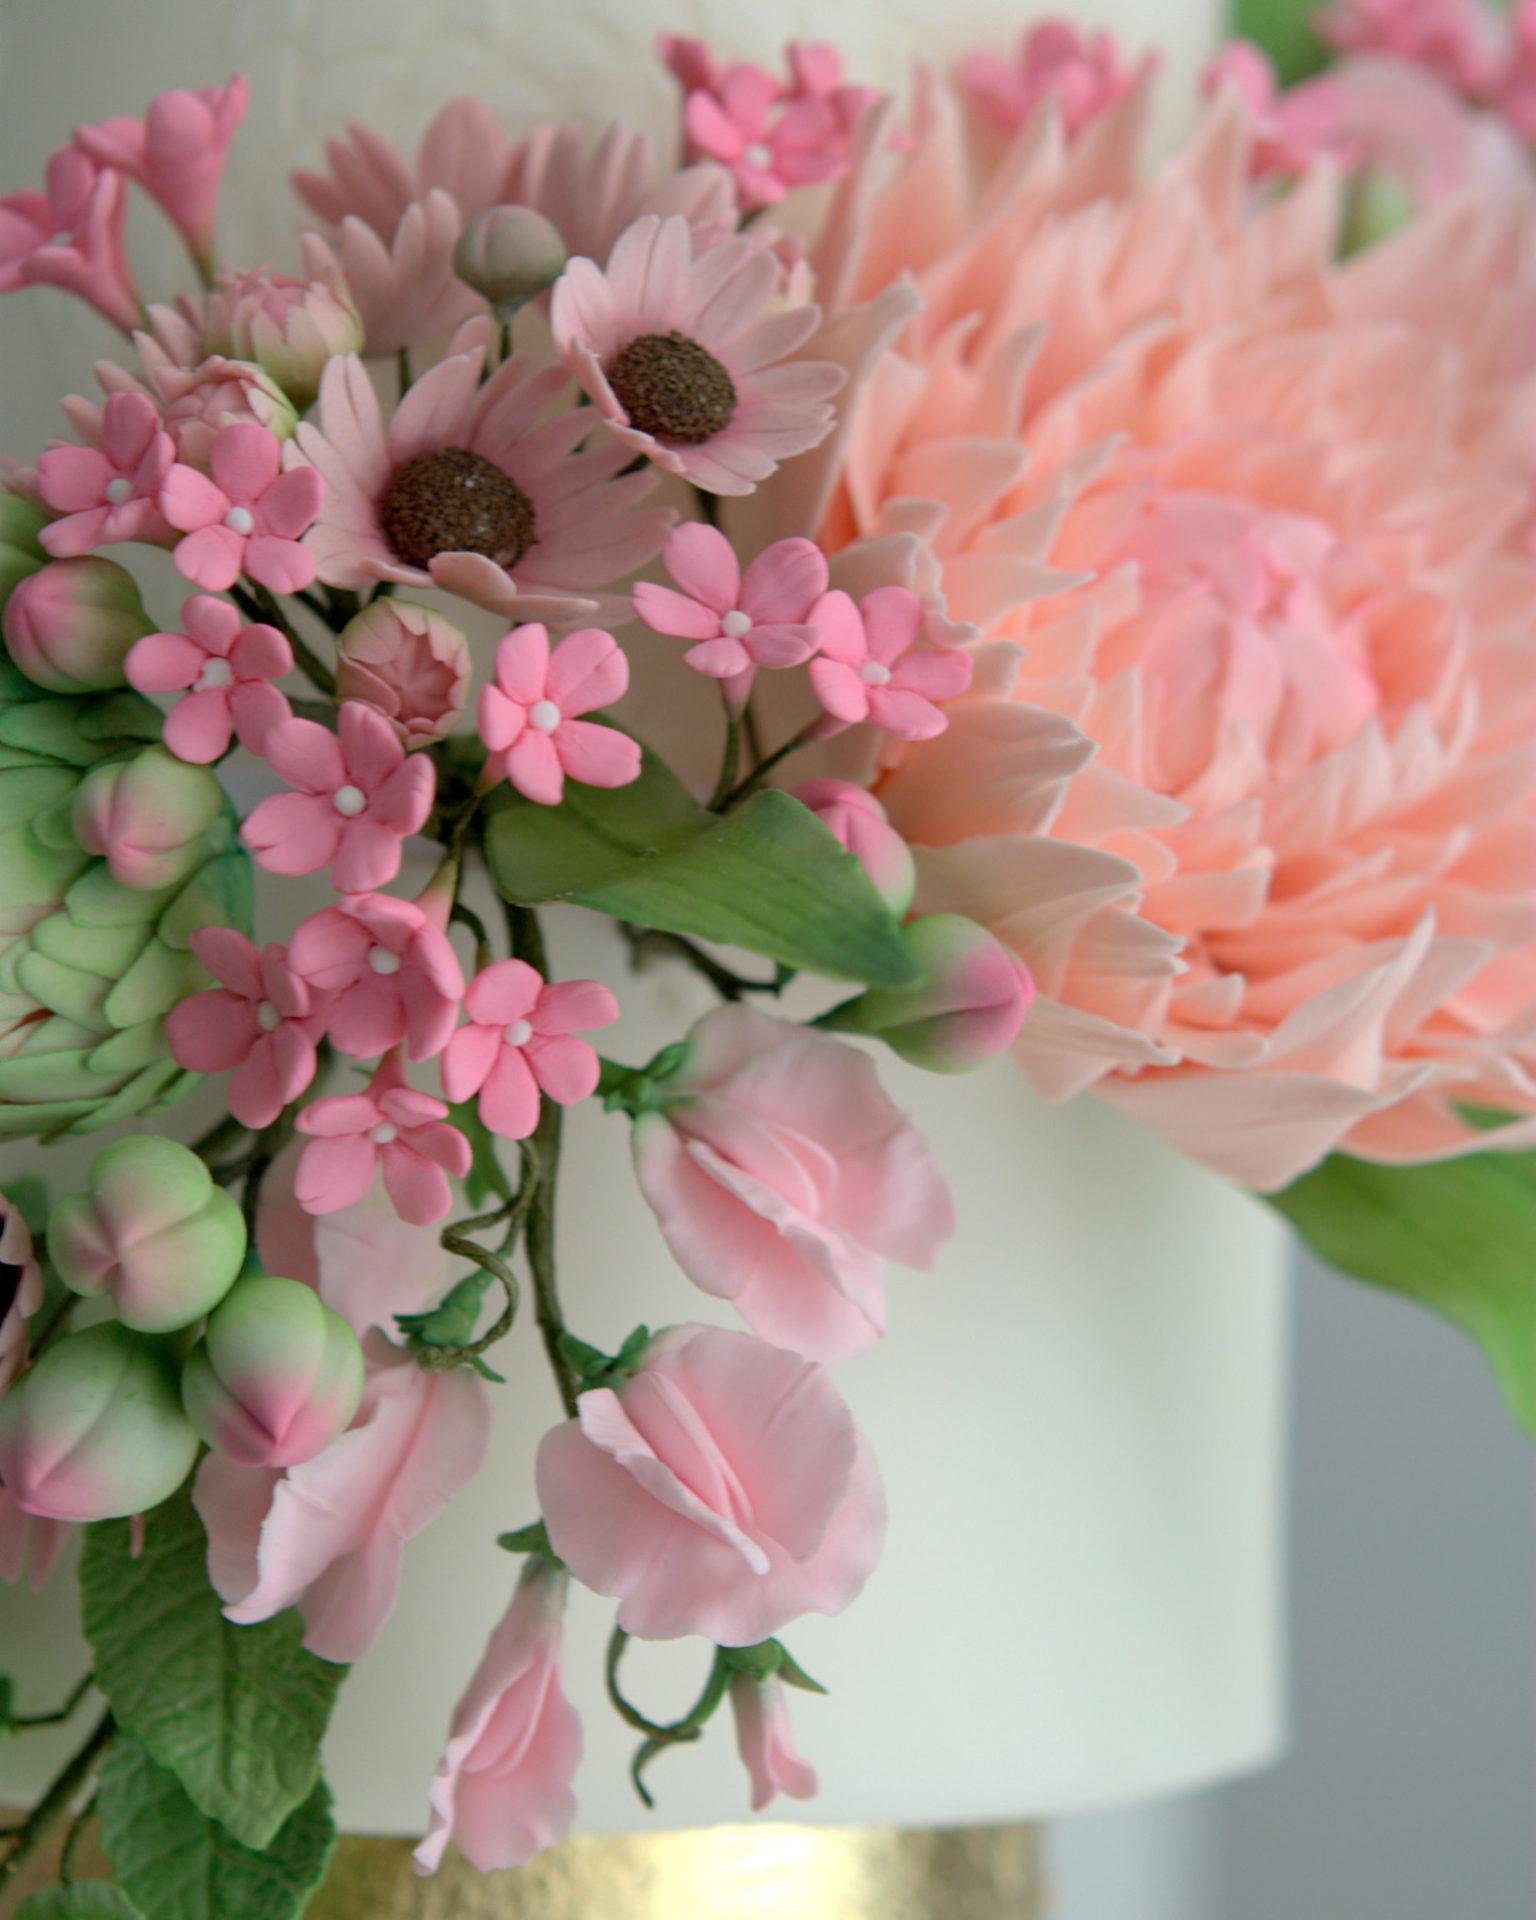 Master Class Flores de azucar, sugarflowers, curso reposteria, barcelona, mericakes, flores de azucar, pasta de goma, gumpaste, 4